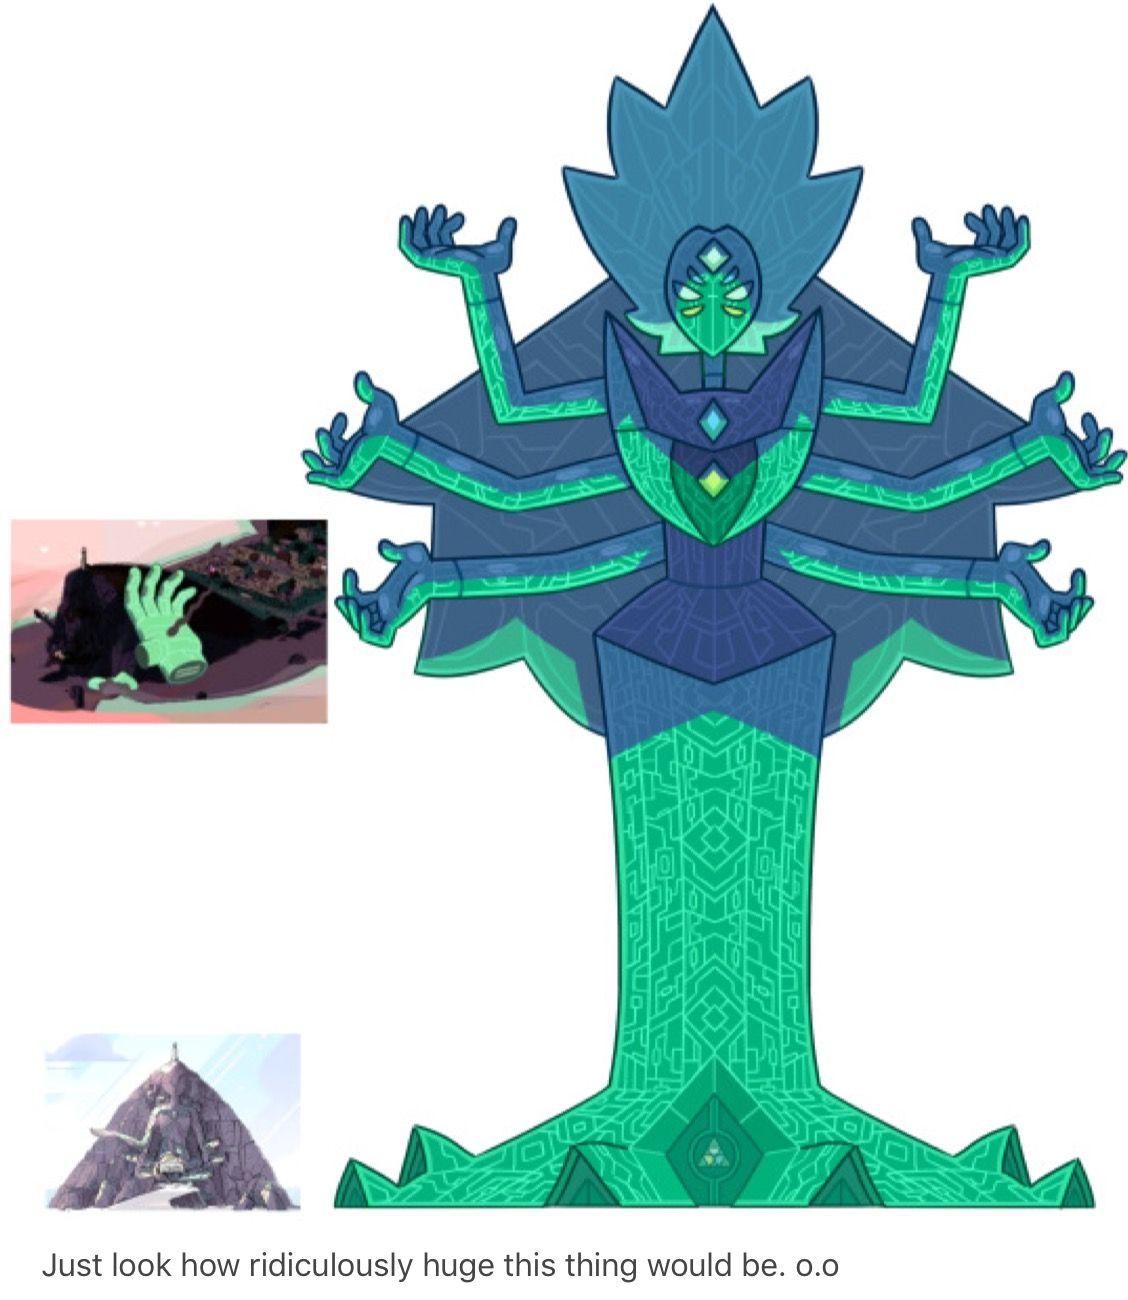 Where did they take the Diamond Arm